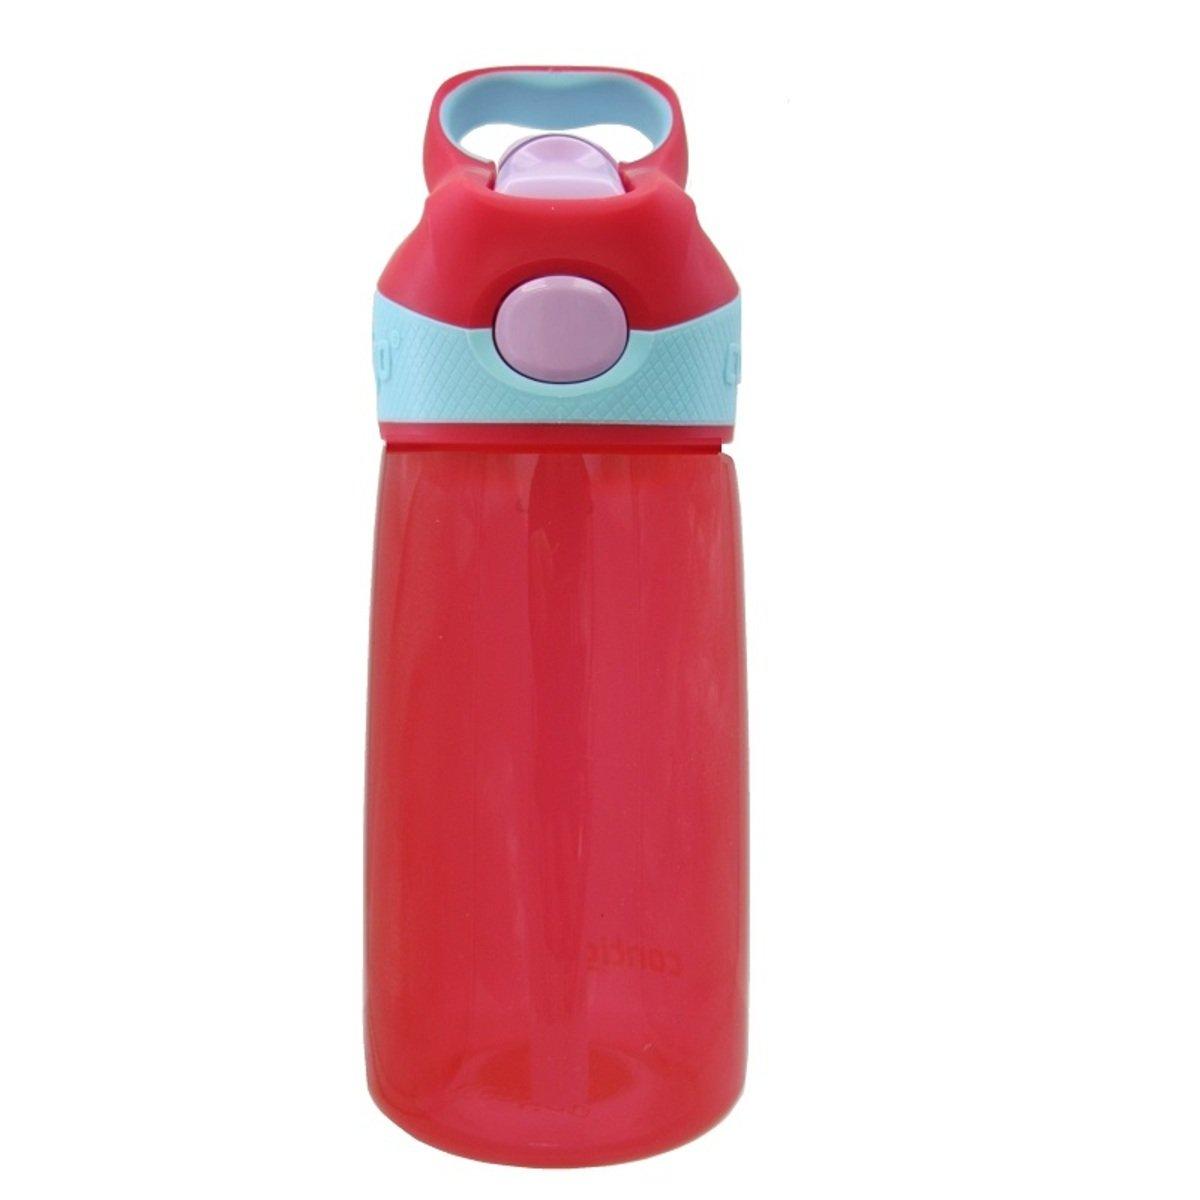 Striker 兒童吸管杯 - 紅色